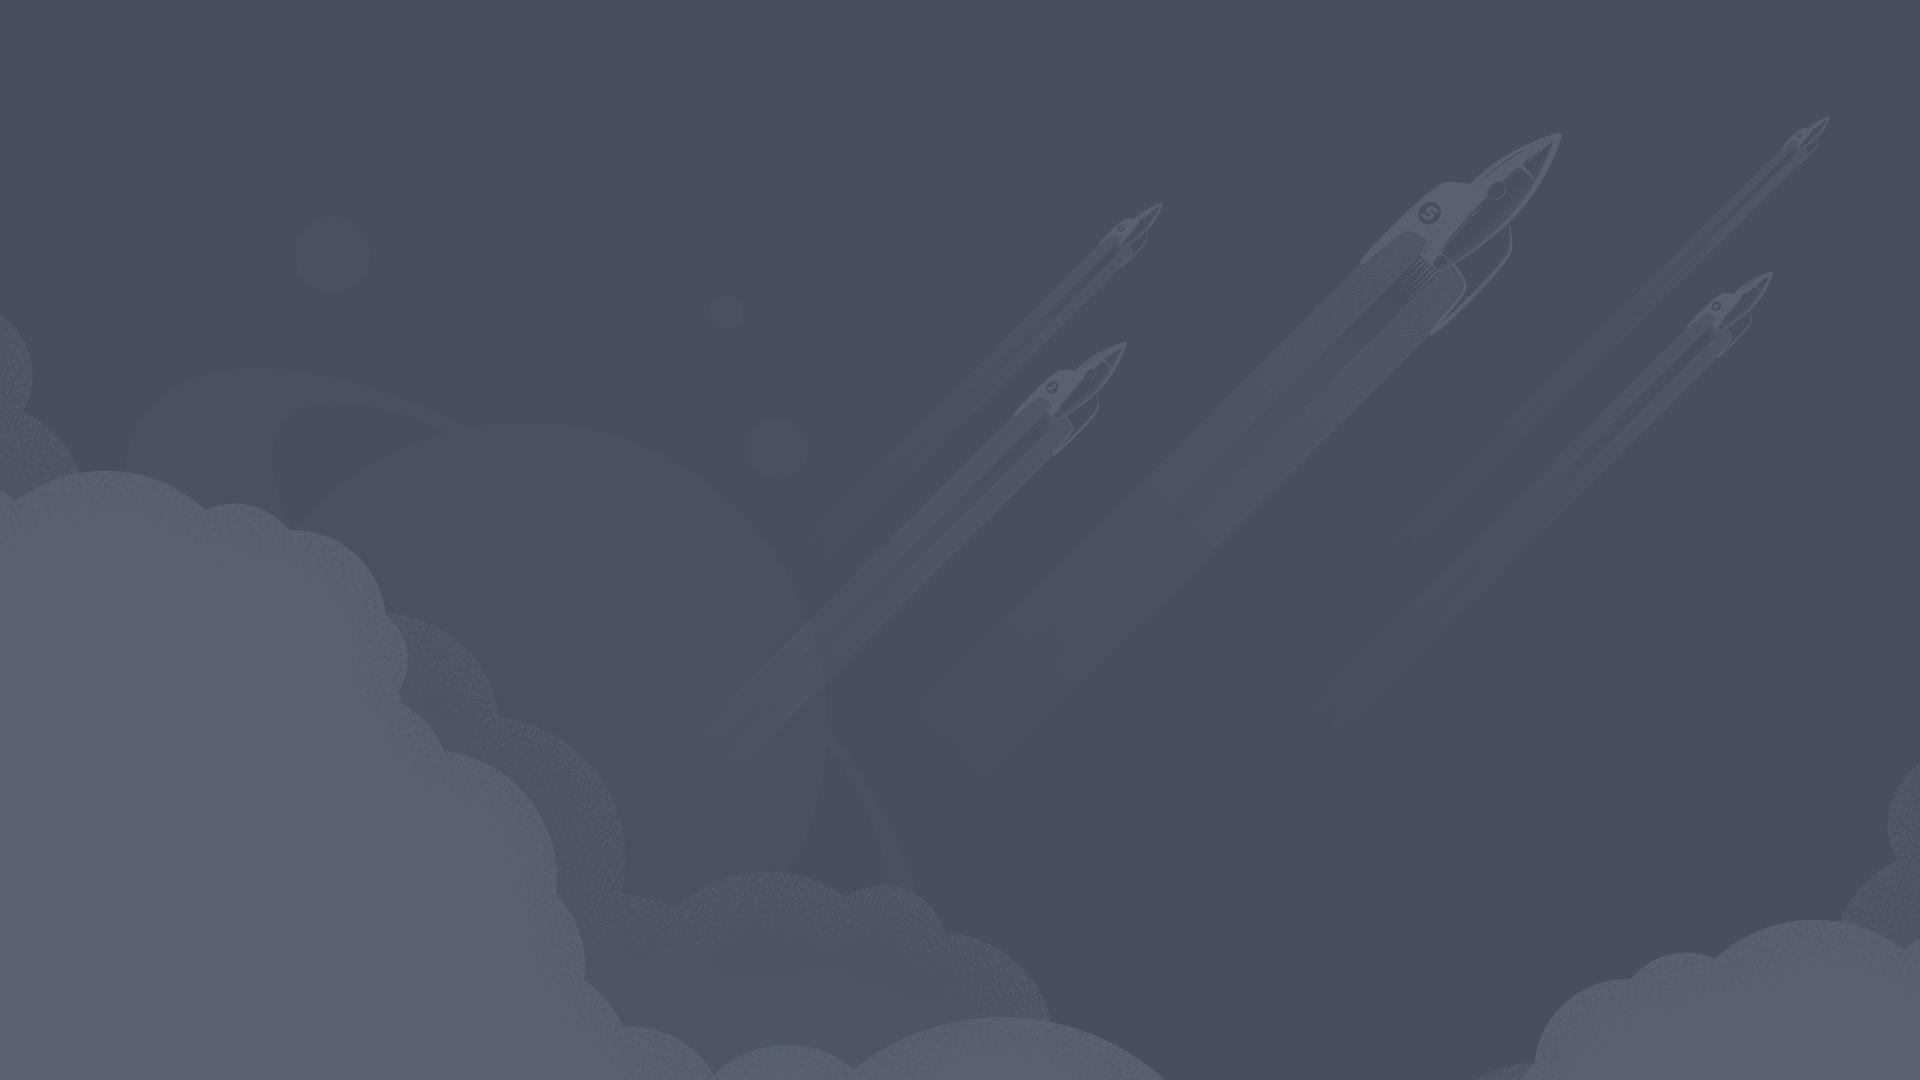 5 rockets blasting off